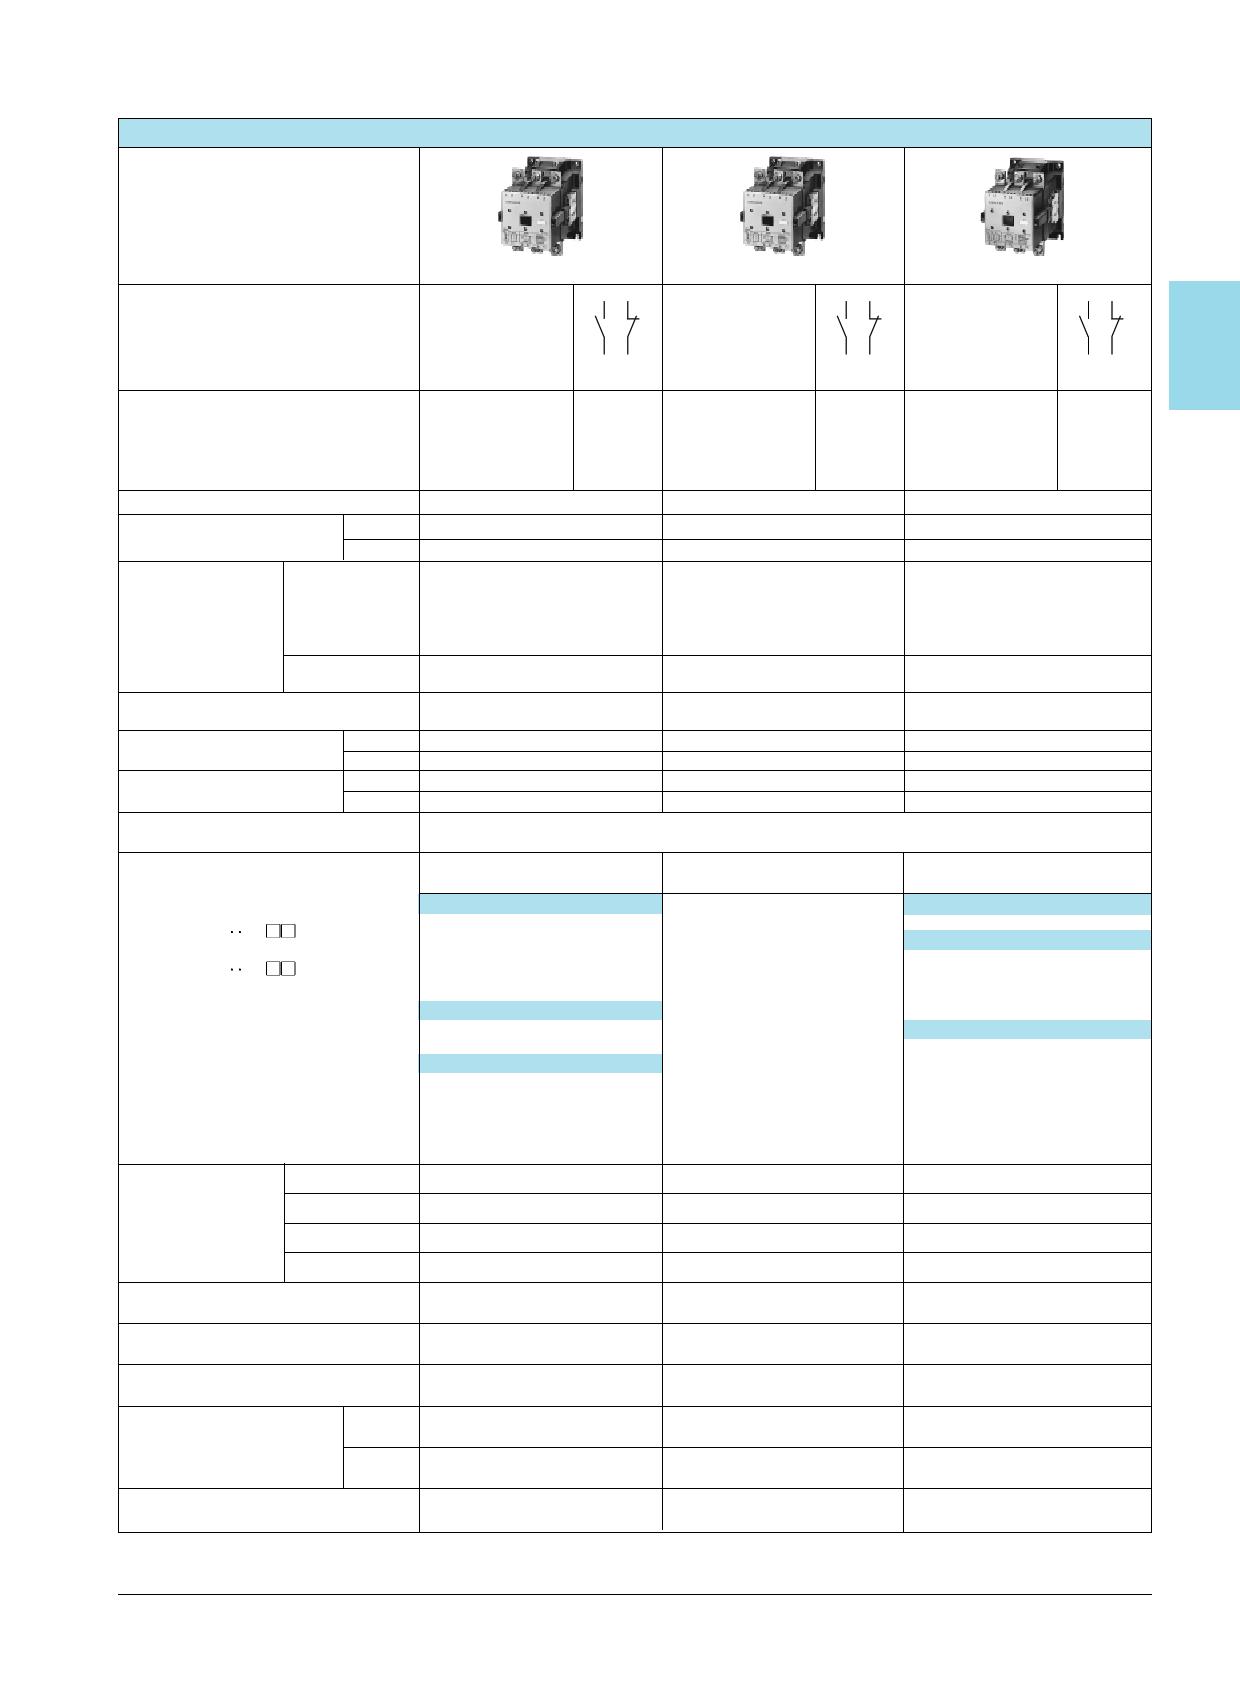 3TF44 Datasheet, Funktion